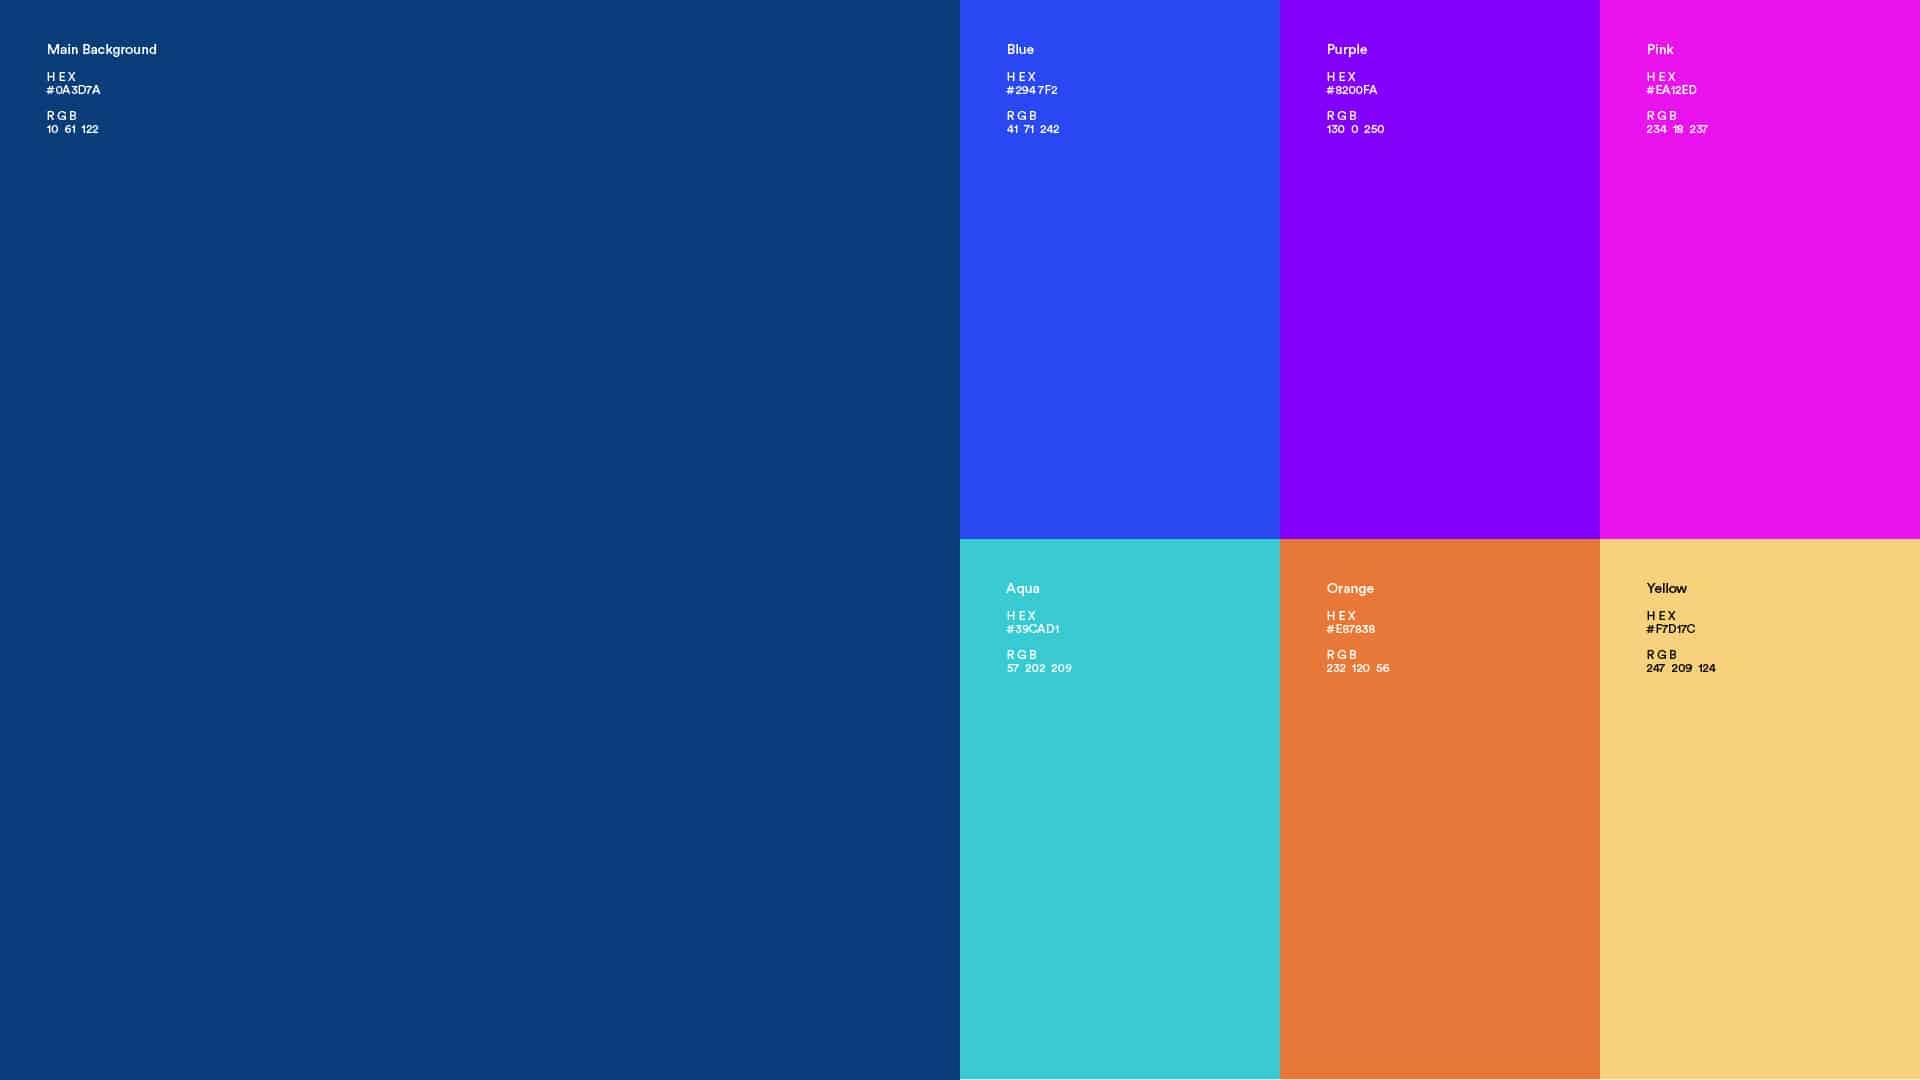 fitosophy-dataworld-summit-colors